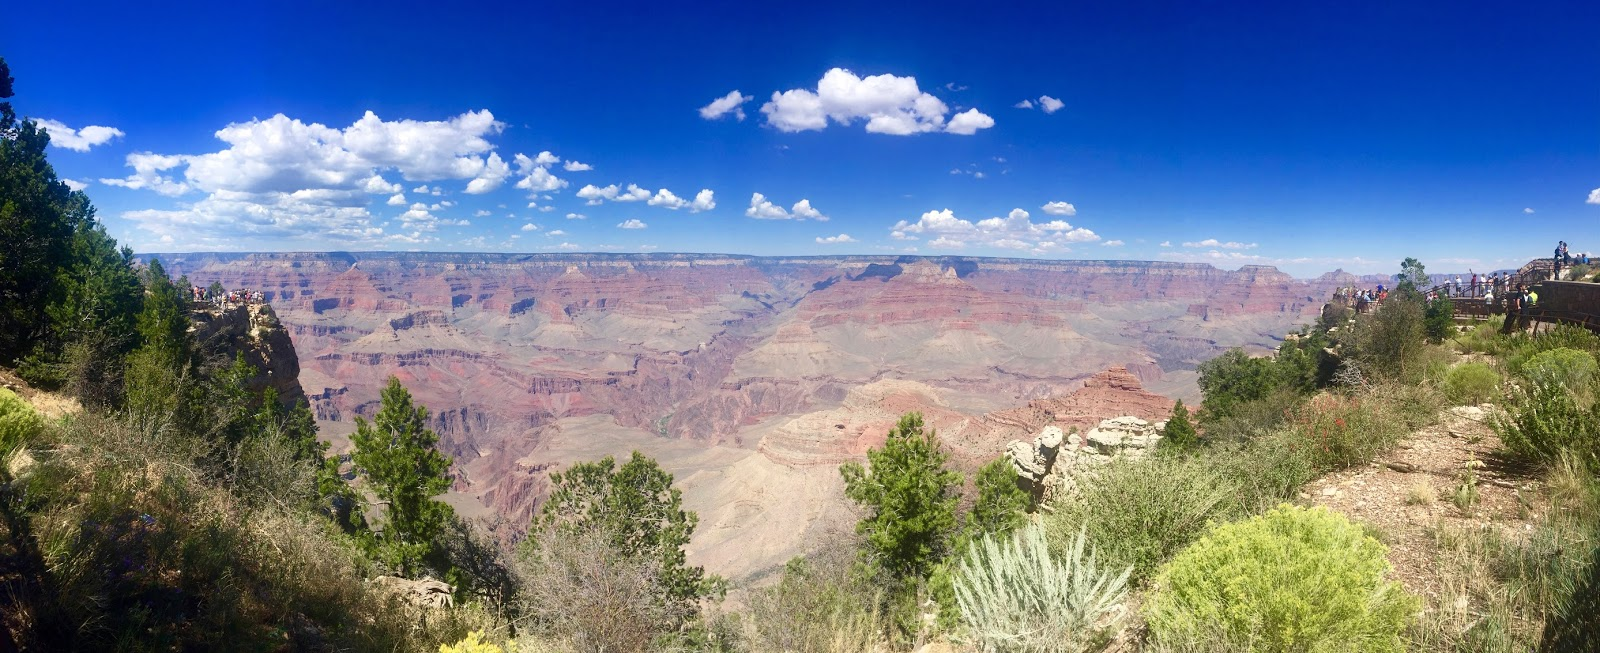 Grand-canyon-arizona